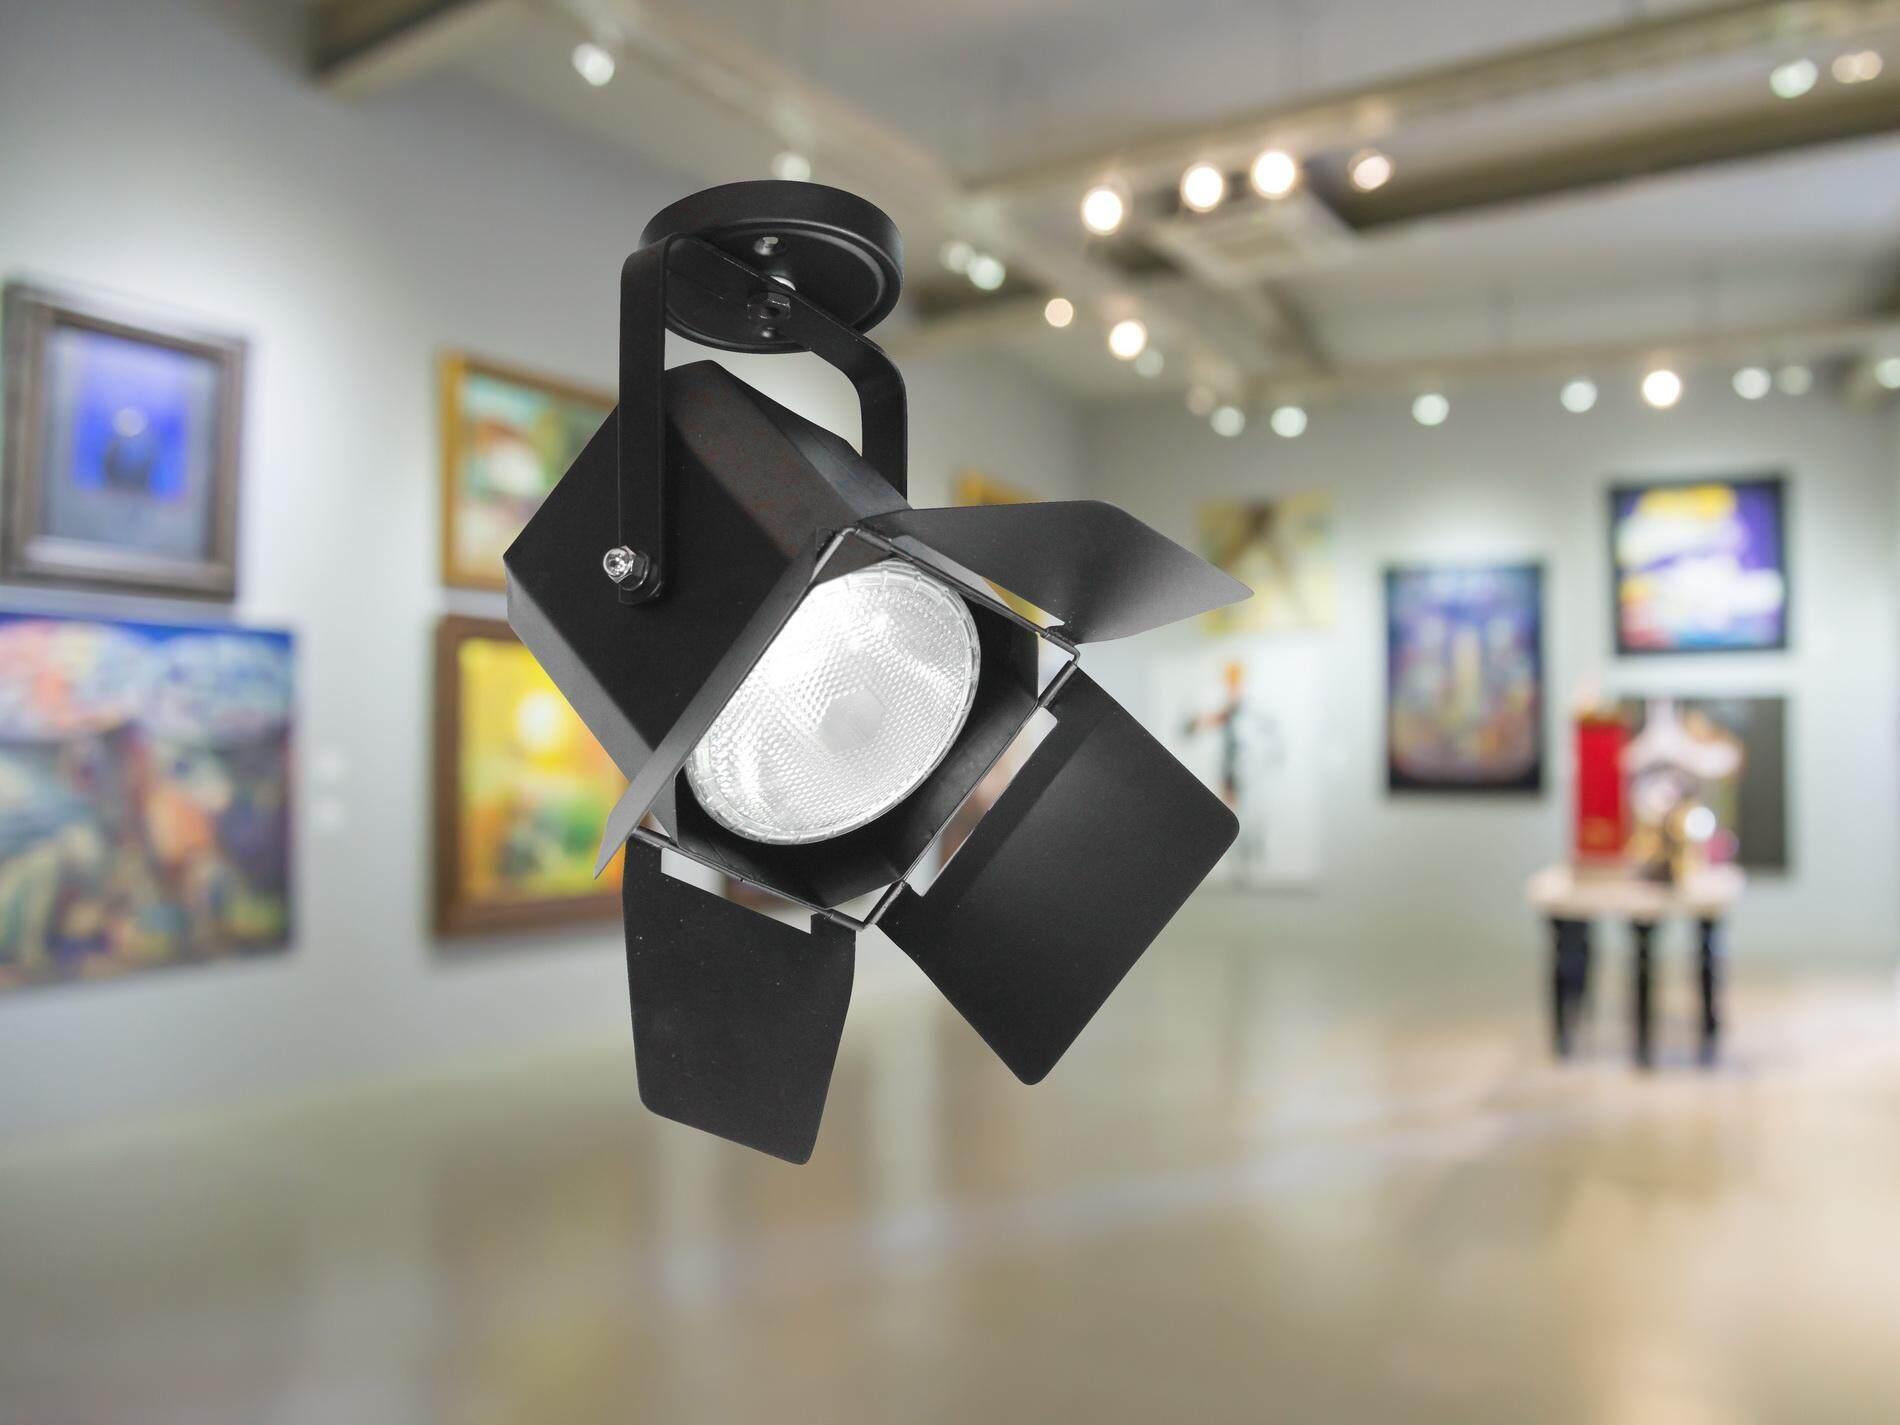 Dento โคมสปอทไลท์ติดแป้น Spotlight 1xe27 สีดำ Fb156m.